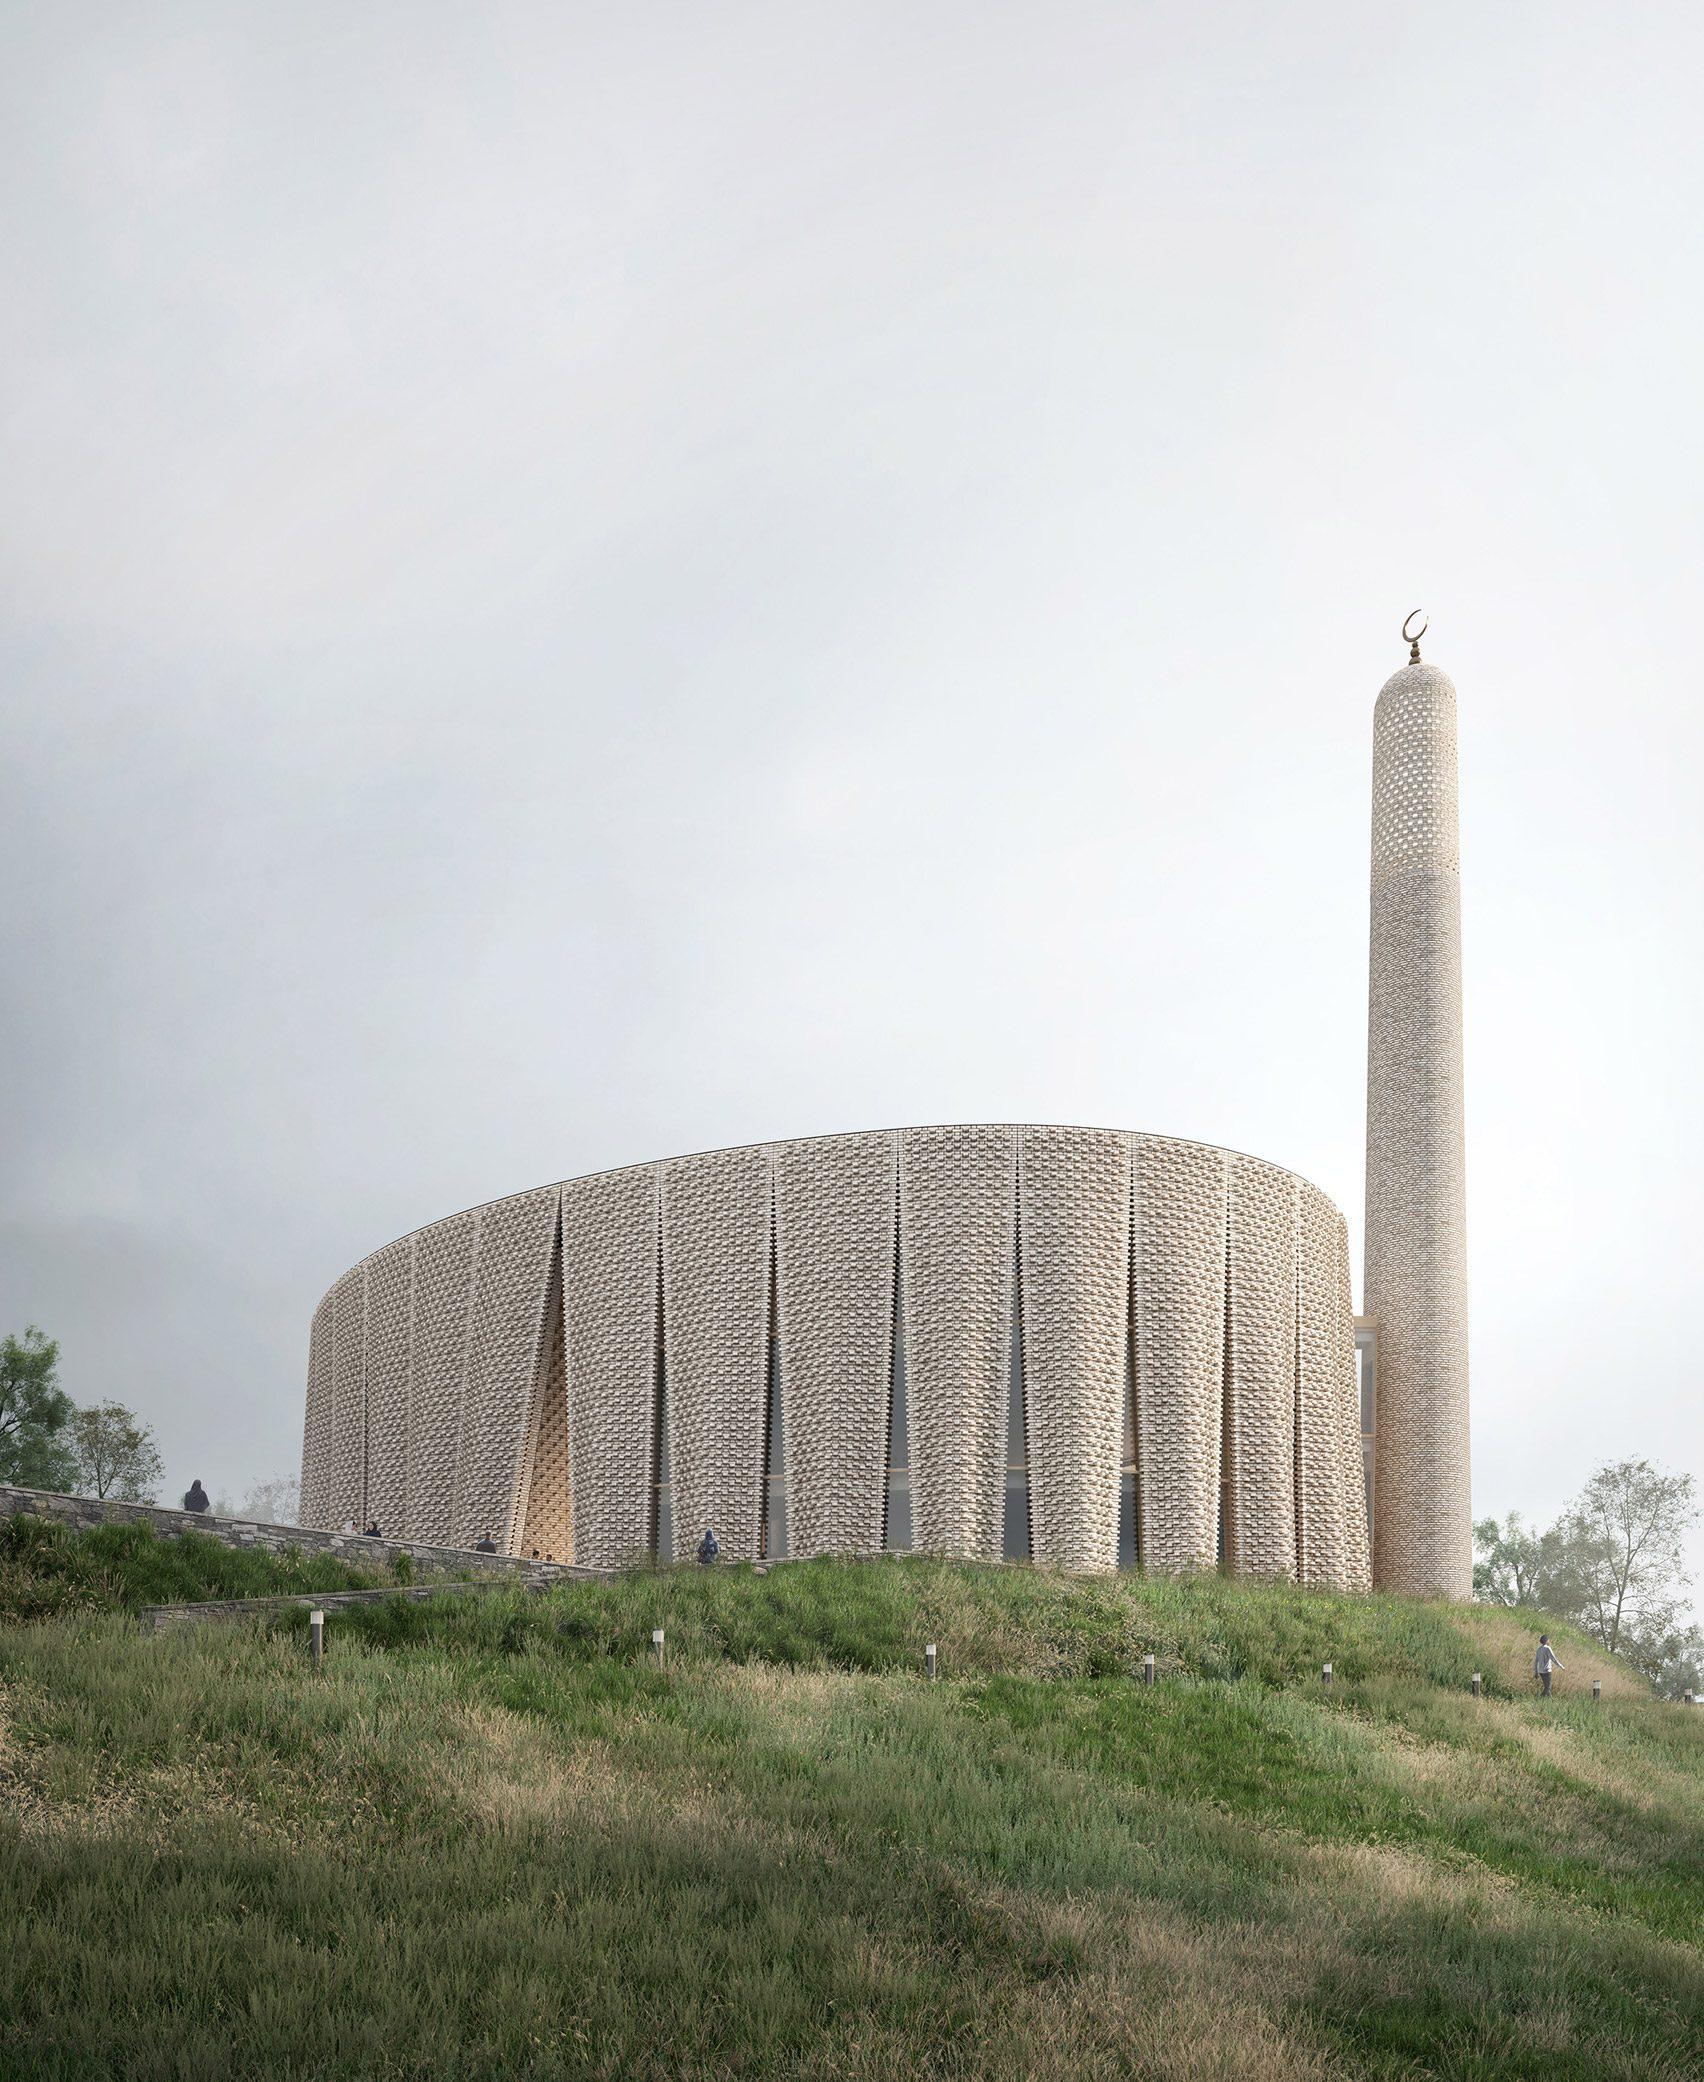 Визуализация предлагаемой мечети Brick Veil